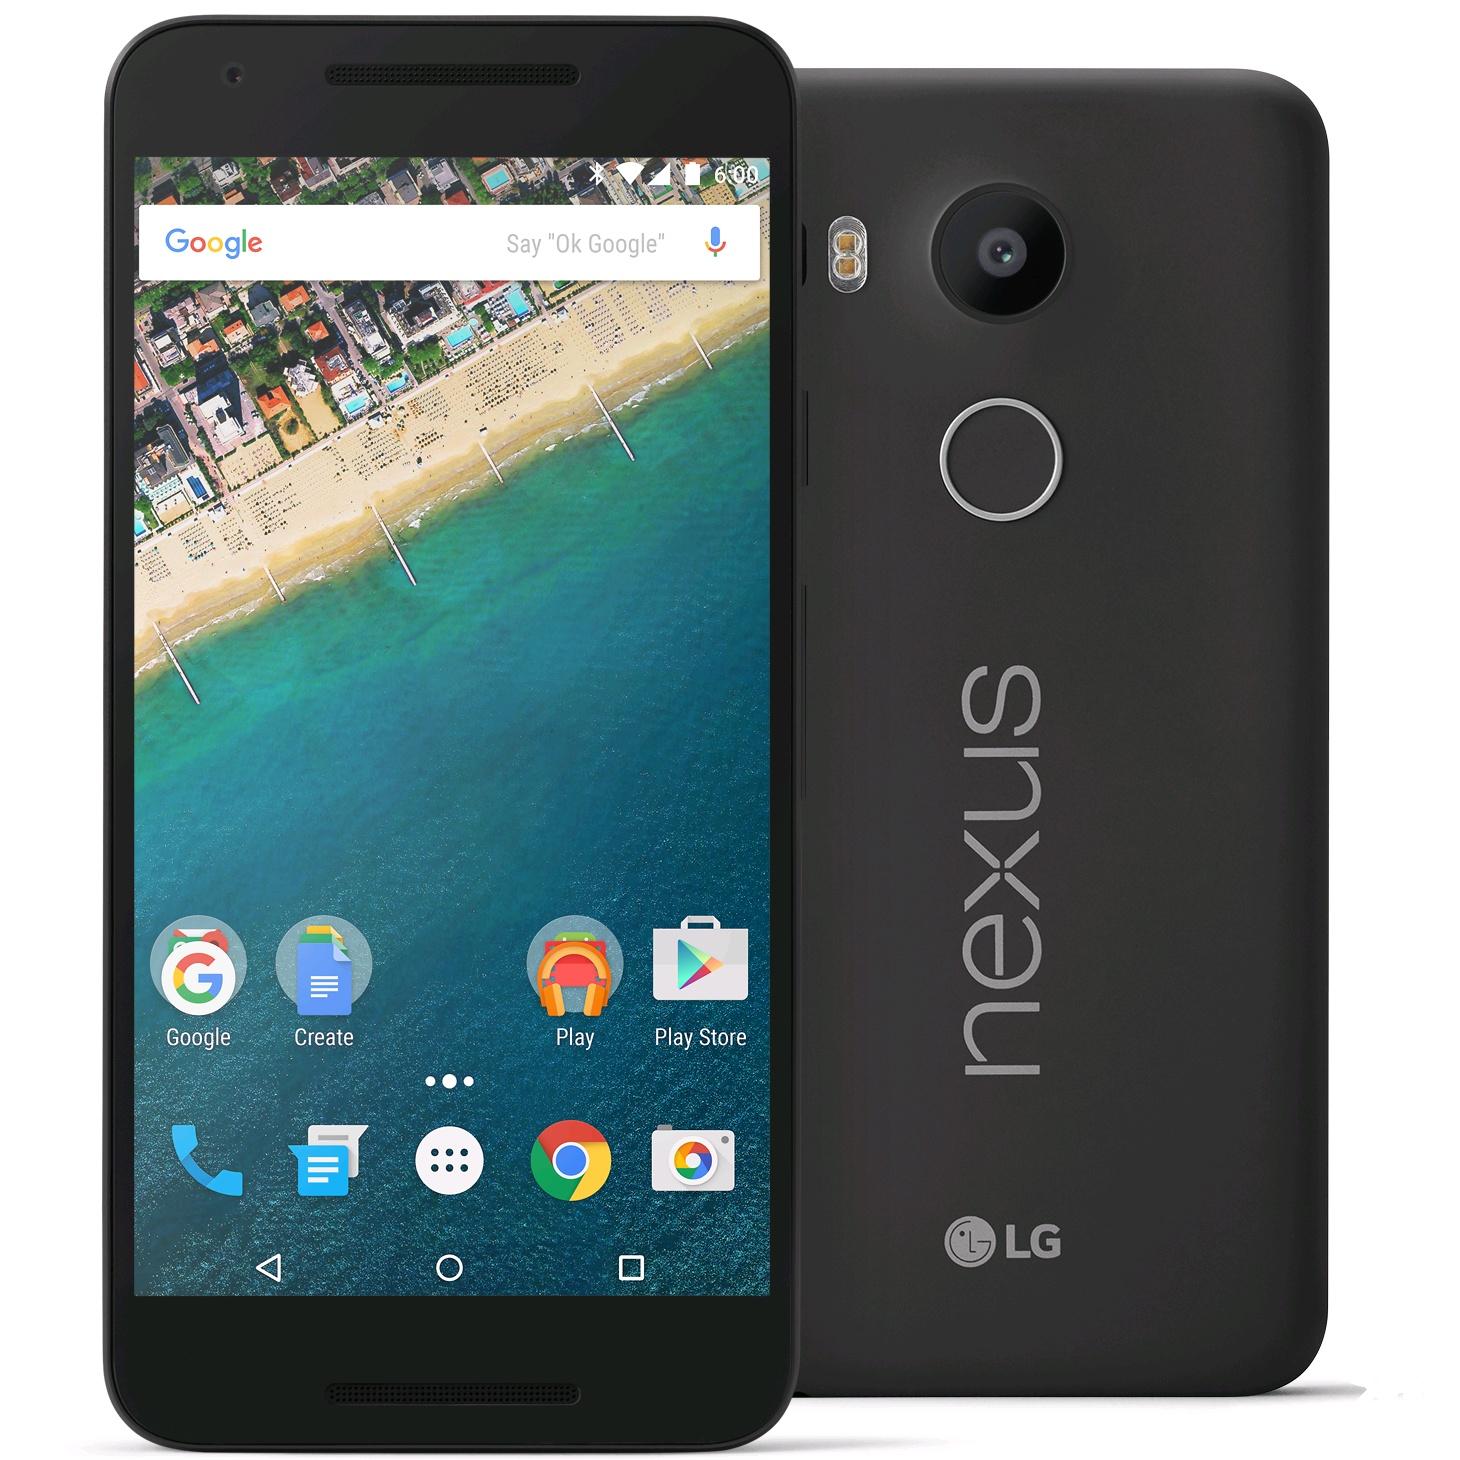 Project Fi Service: LG Google Nexus 5x 4G LTE Smartphone: 32GB $250, 16GB  $200 (Activation Req.)